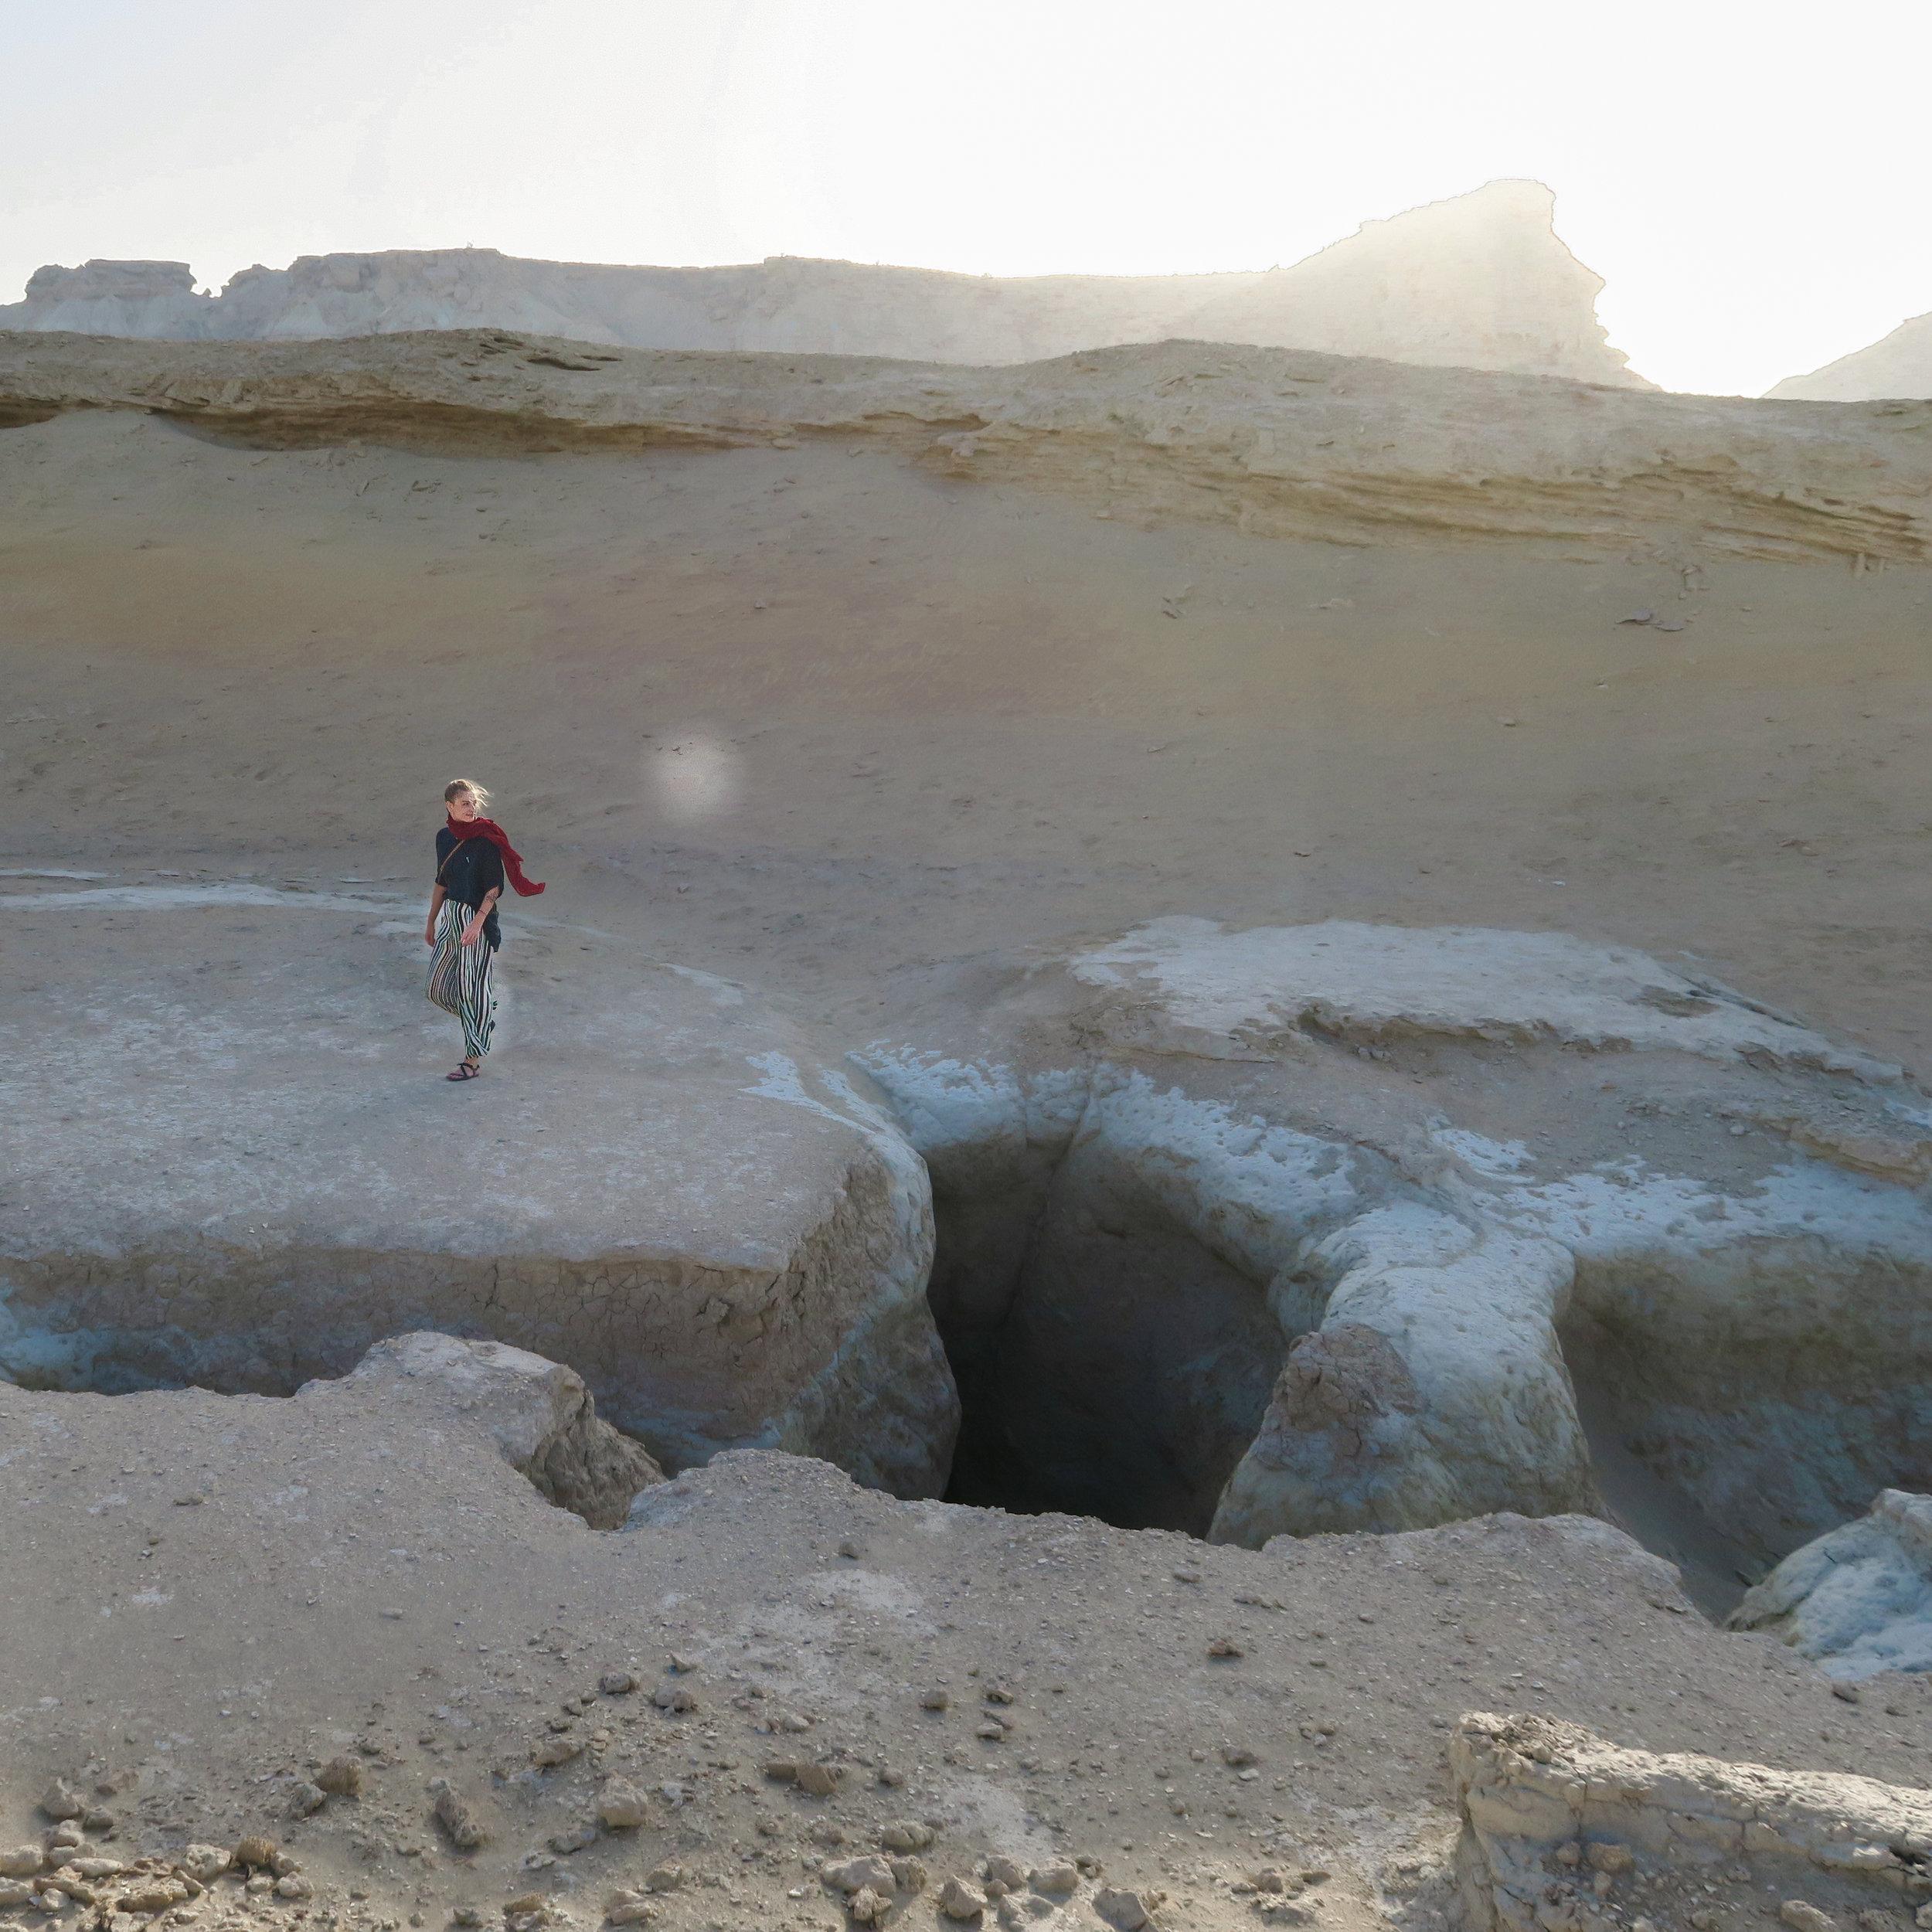 Evelina wandering the Valley of the Stars, Qeshm Island